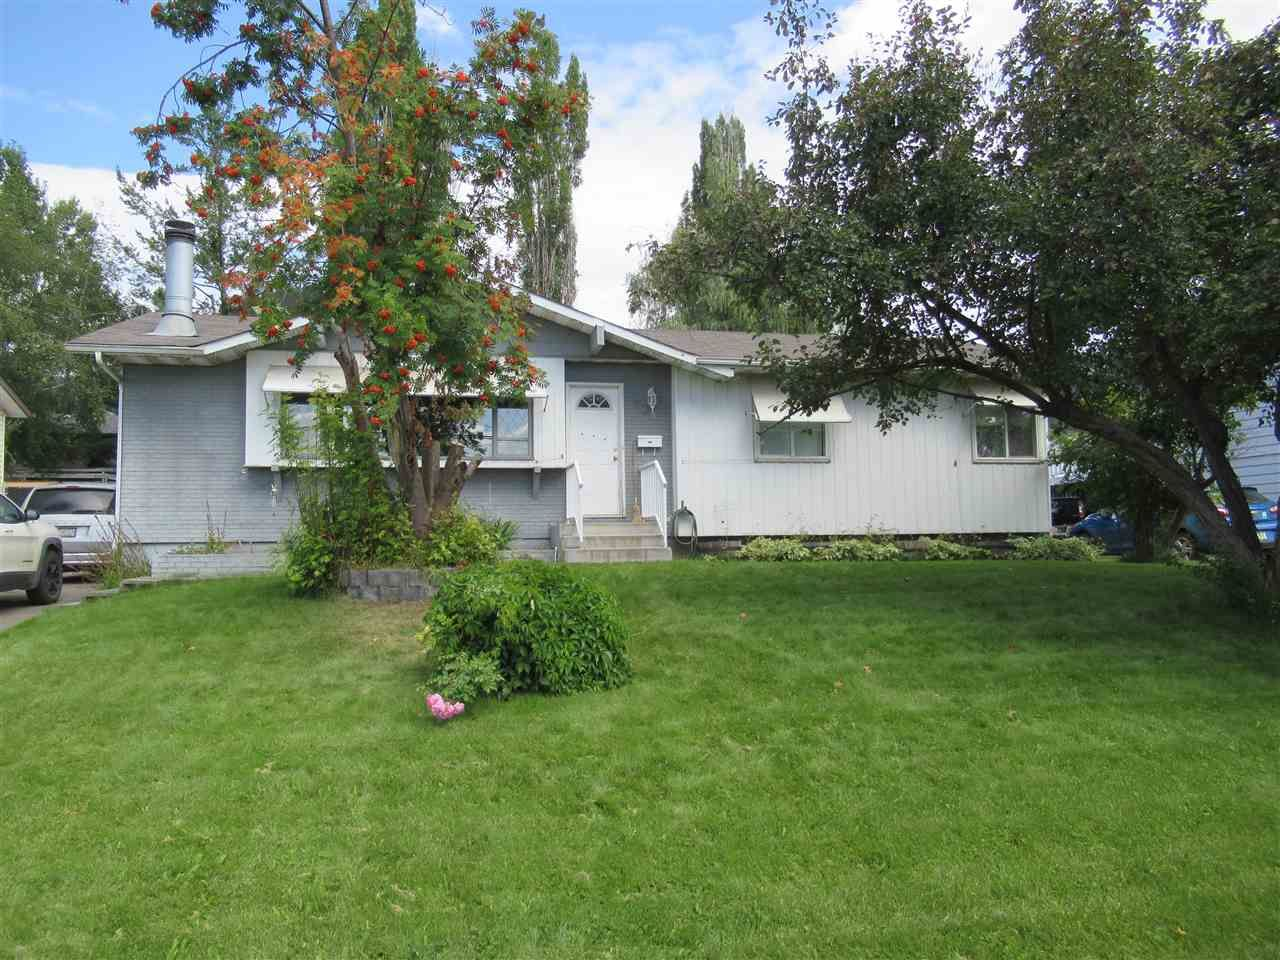 Main Photo: 940 WESTERN Avenue in Williams Lake: Williams Lake - City House for sale (Williams Lake (Zone 27))  : MLS®# R2487941